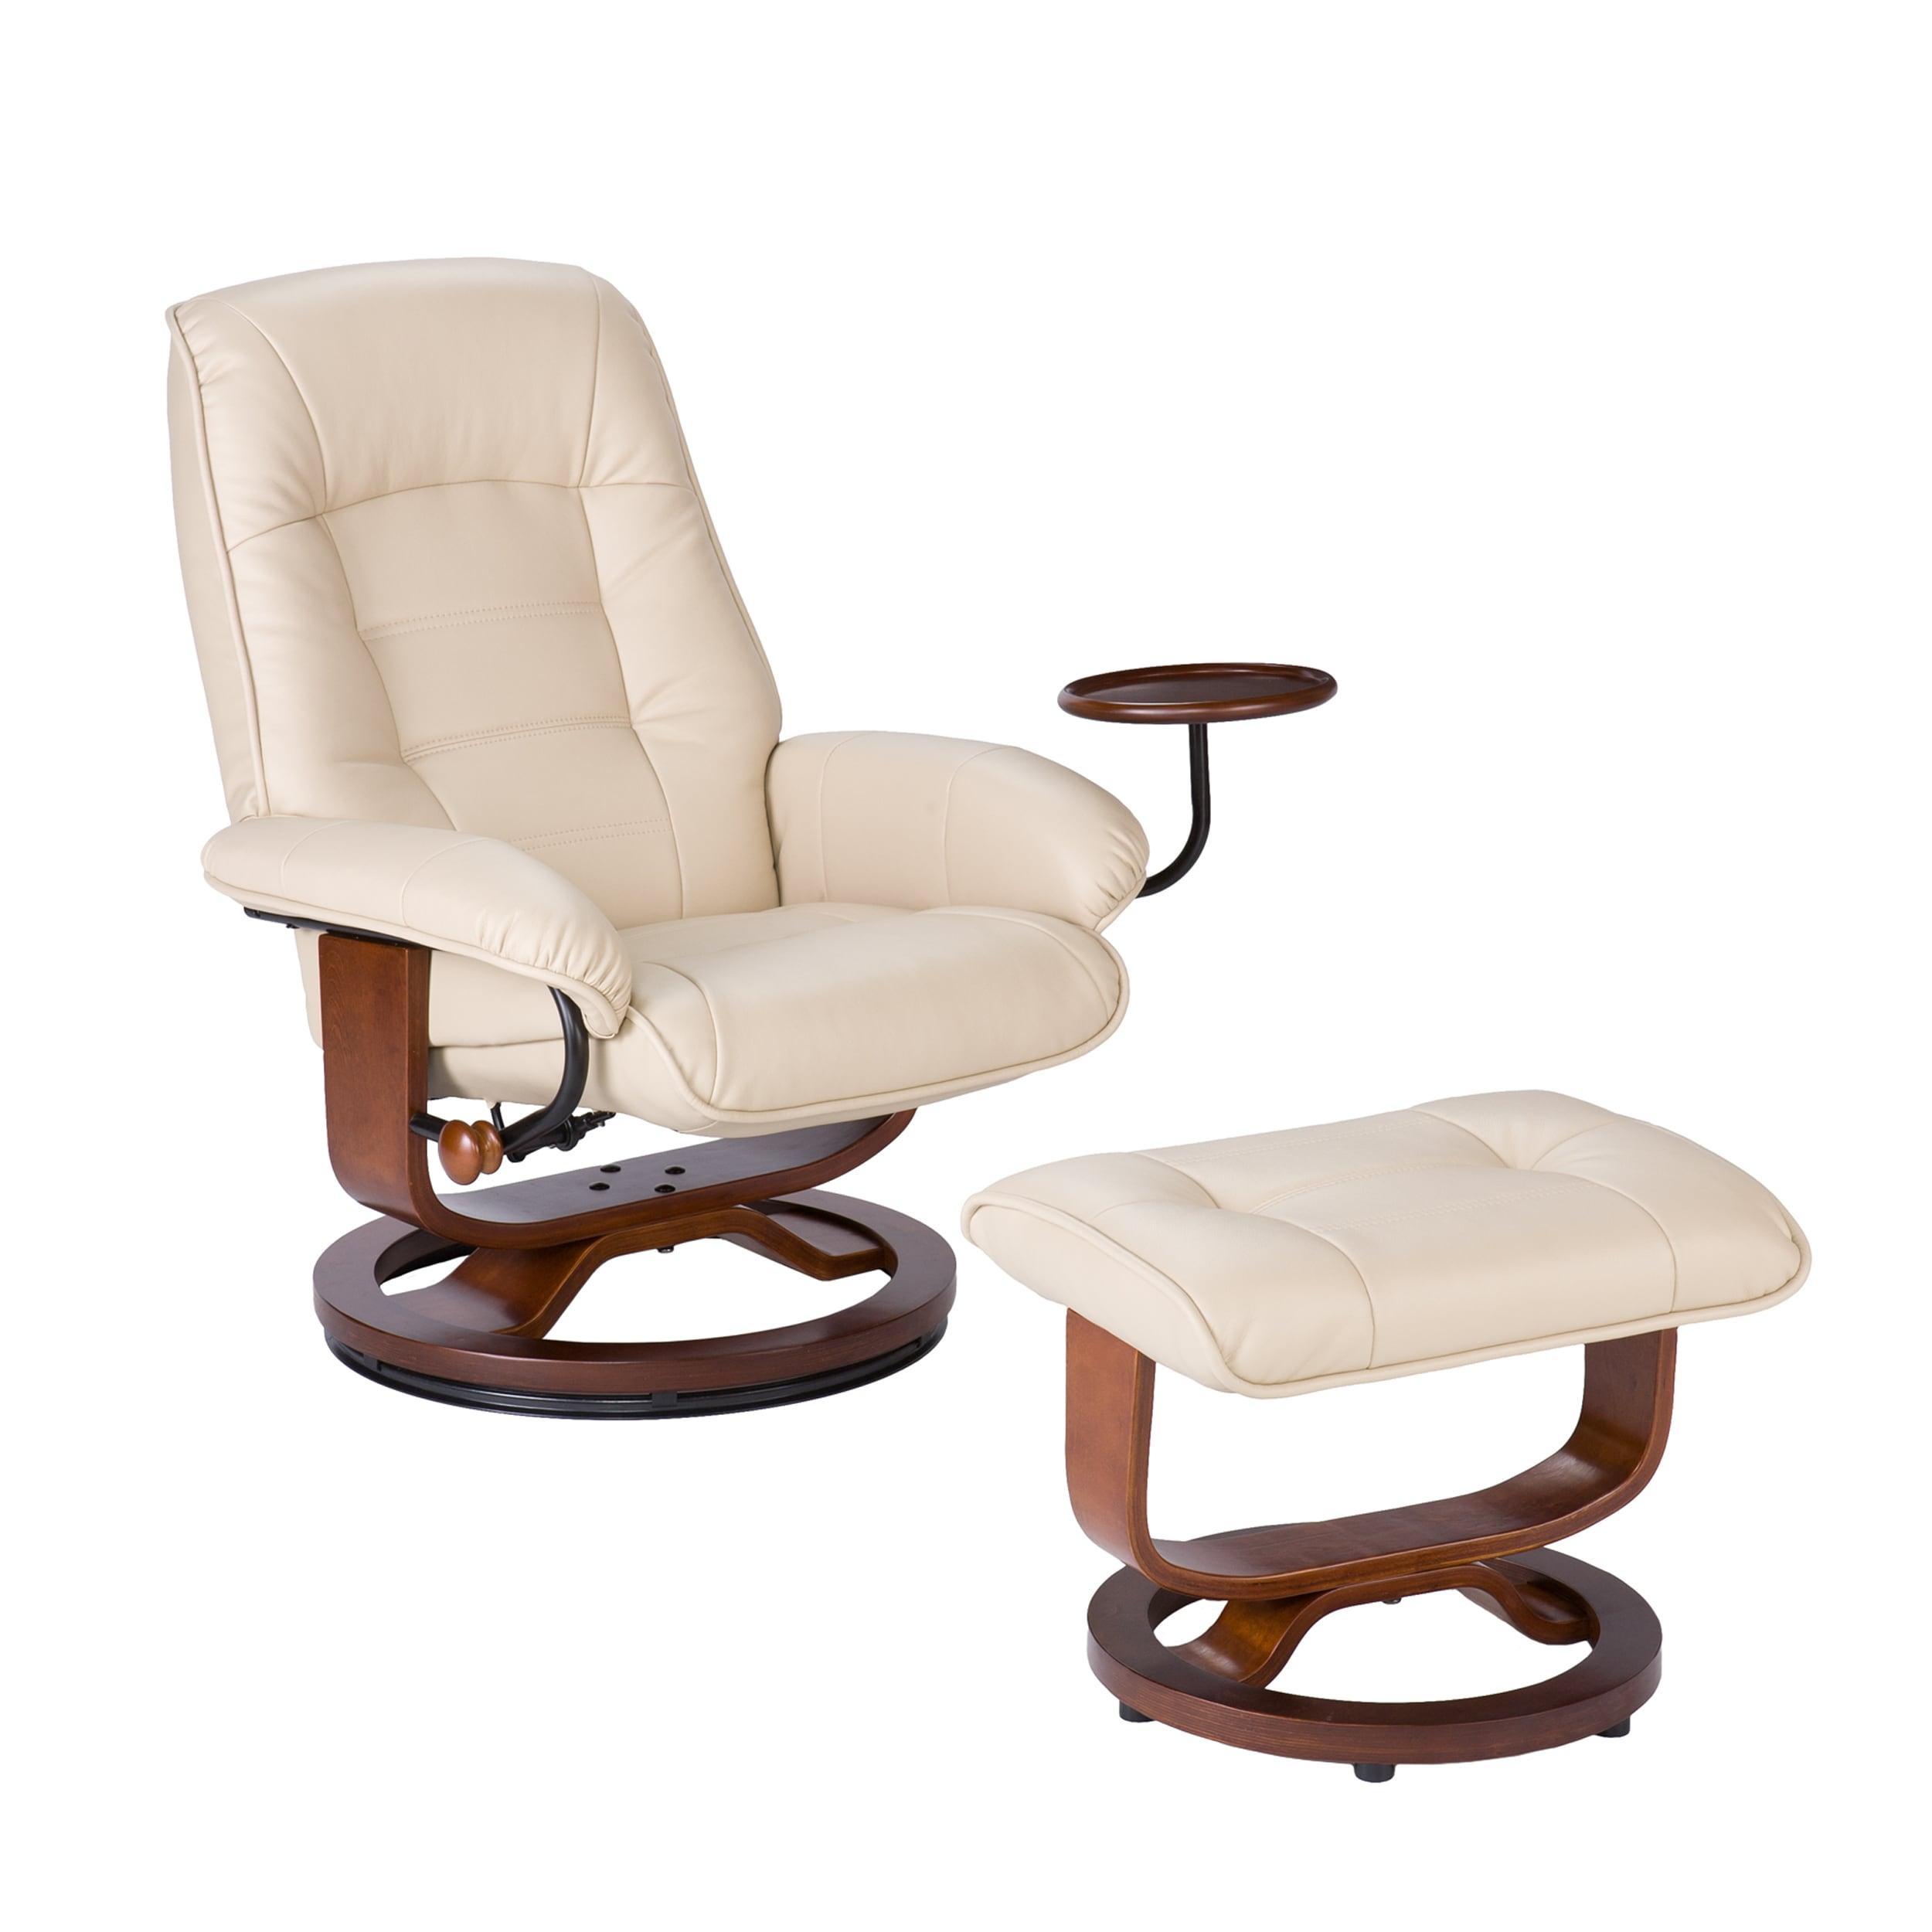 shop harper blvd windsor taupe leather recliner and ottoman set